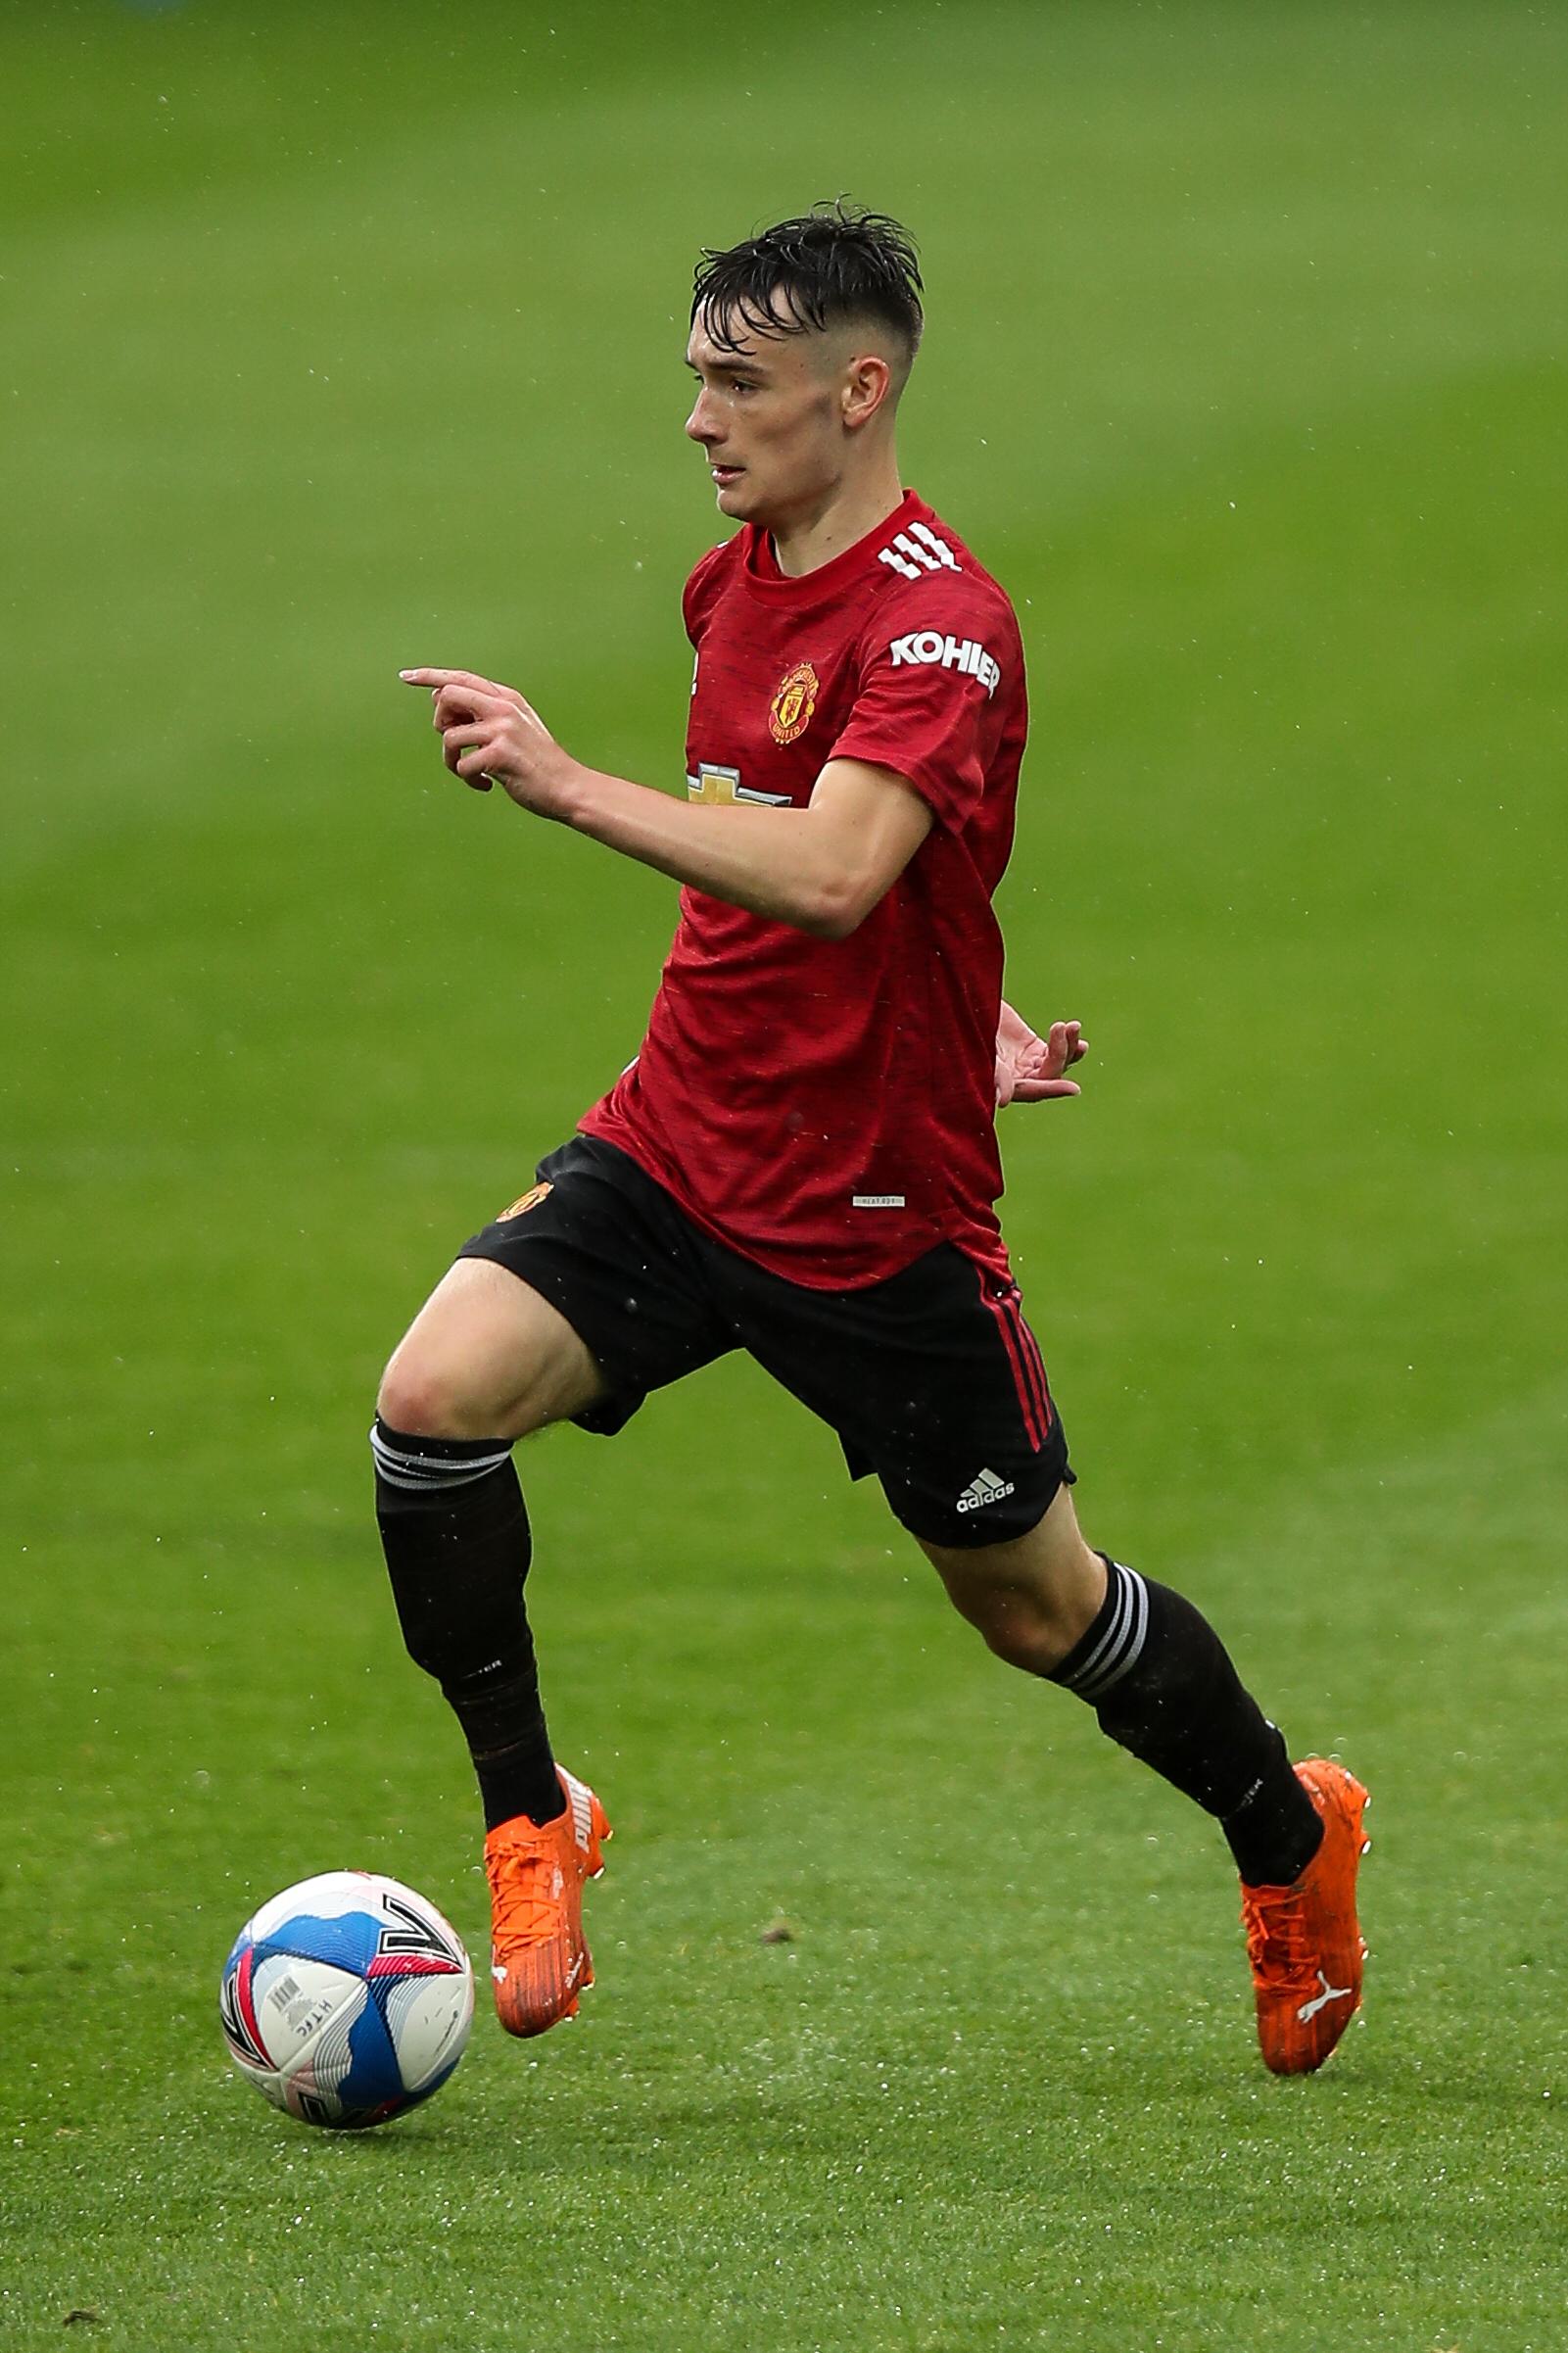 Huddersfield Town v Manchester United U23